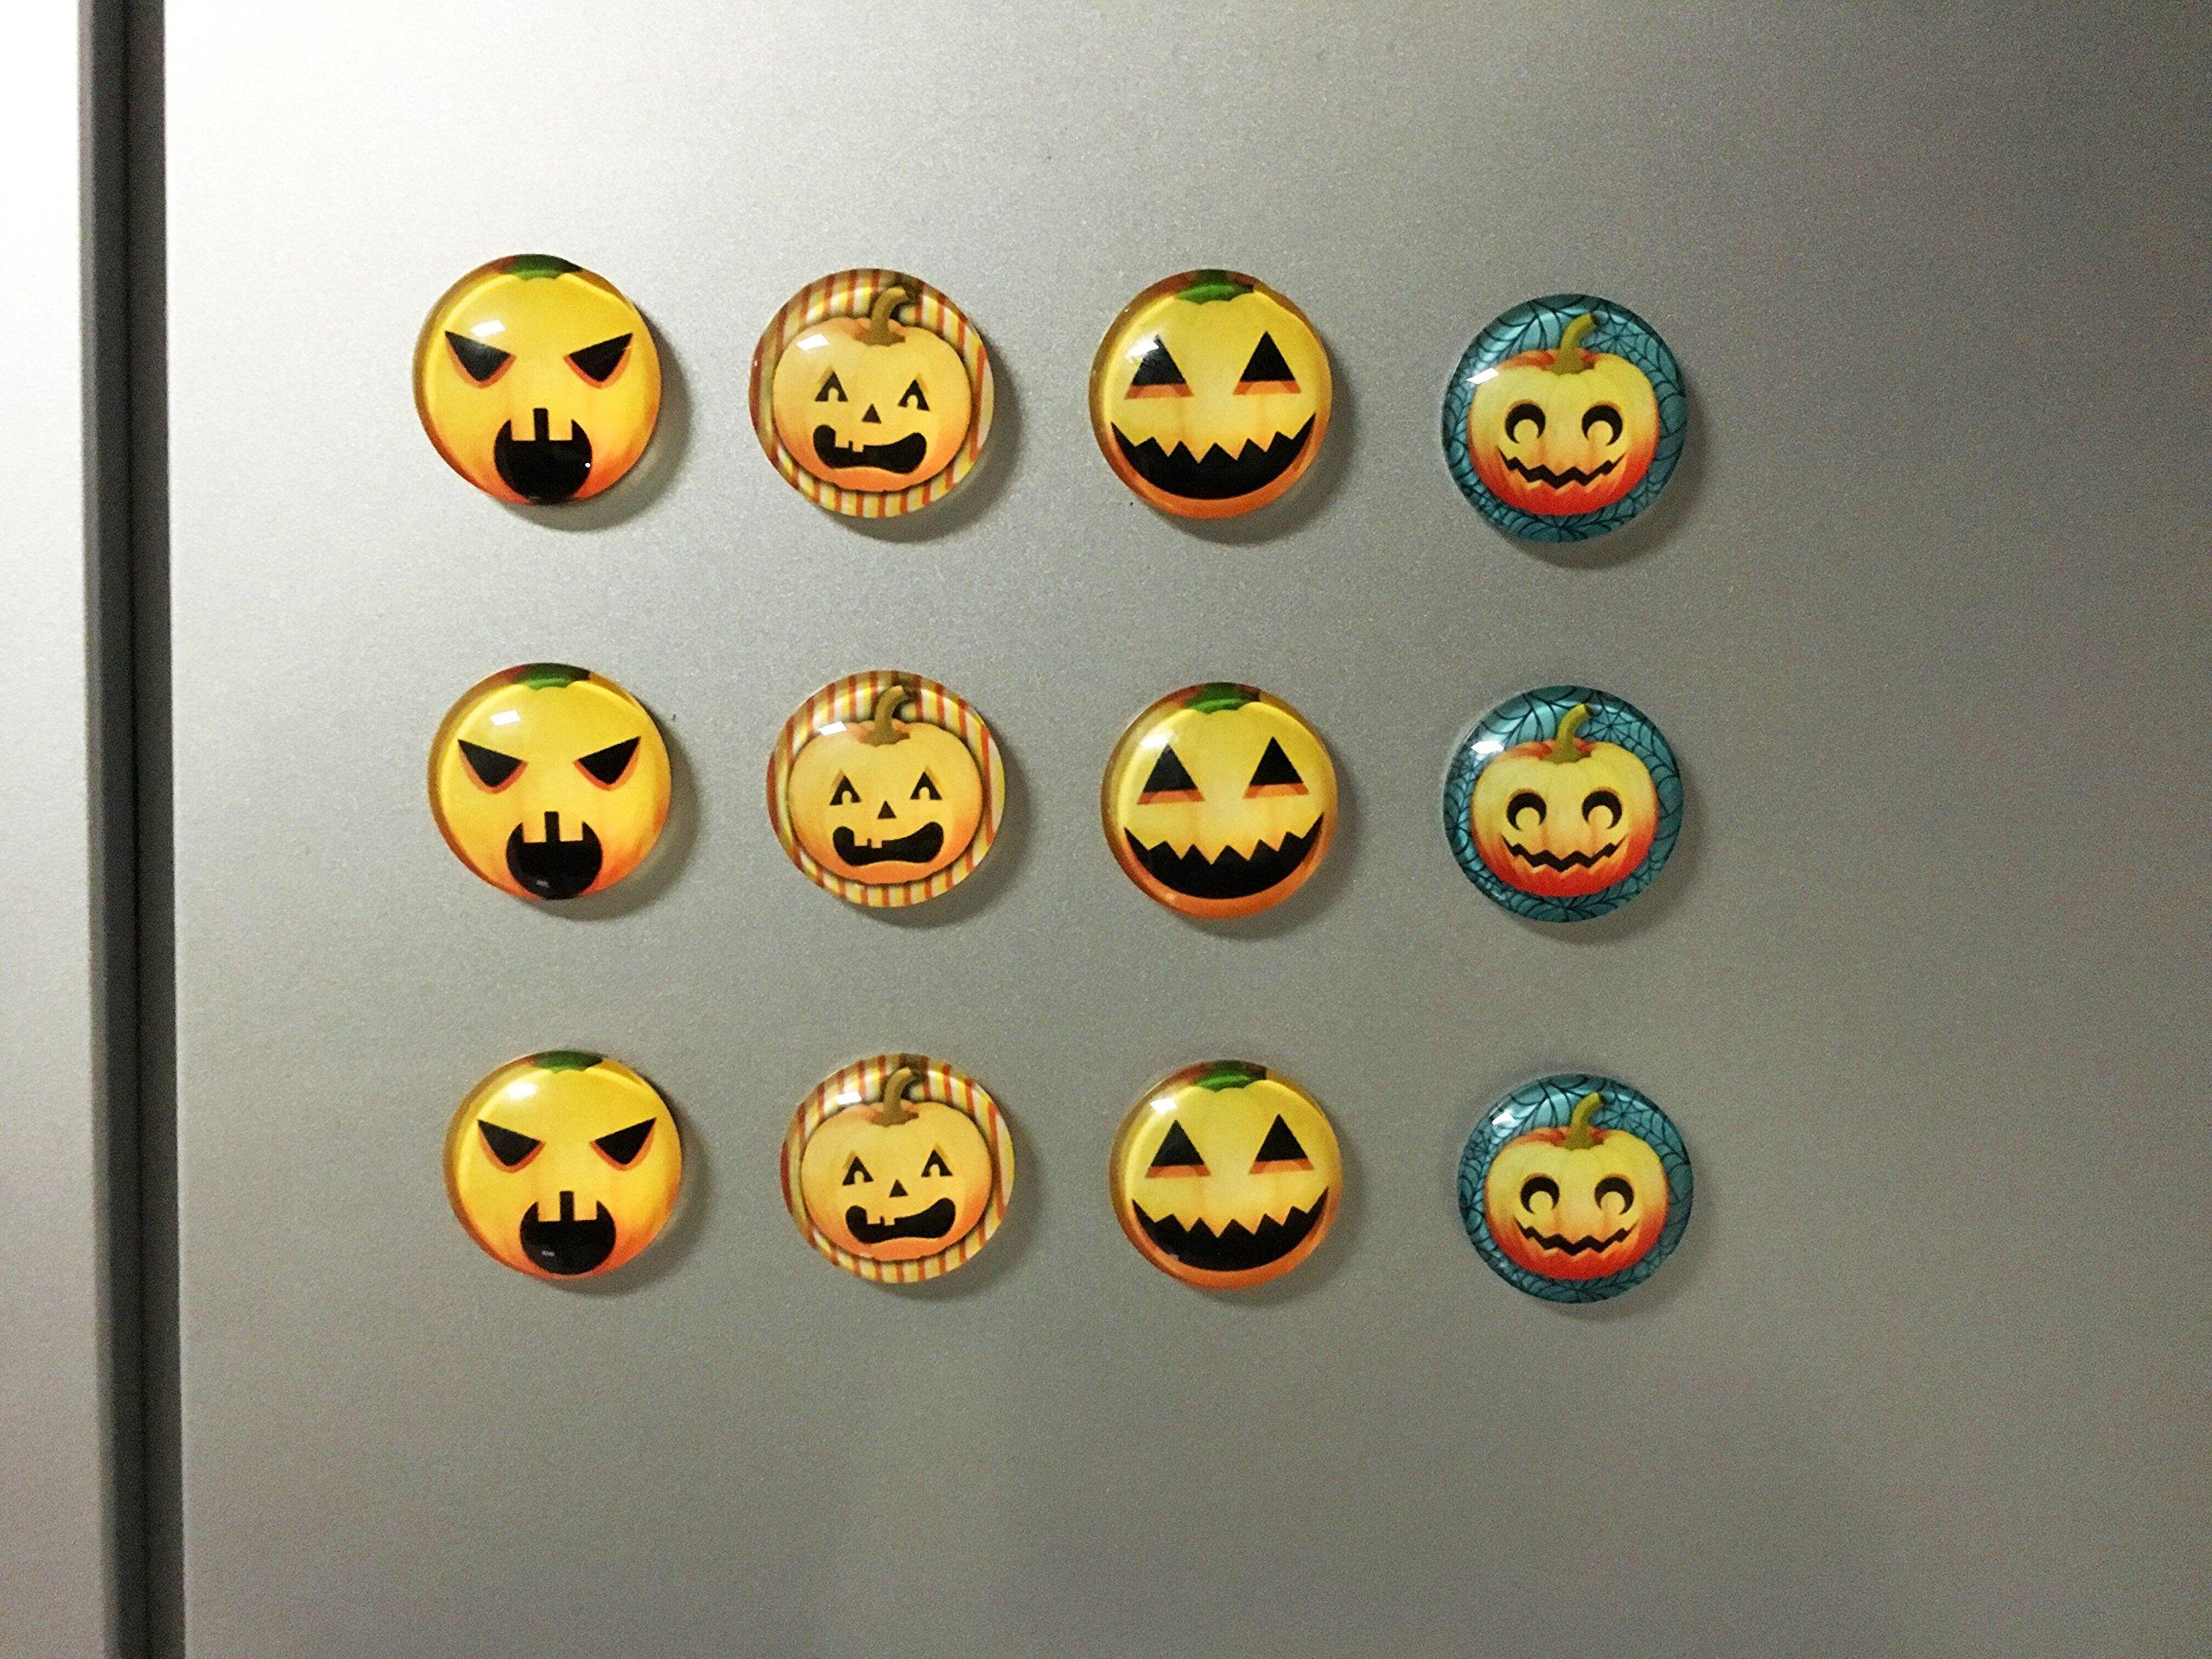 Pawliss Halloween Pumpkin Refrigerator Dishwasher Magnets 12 Pack